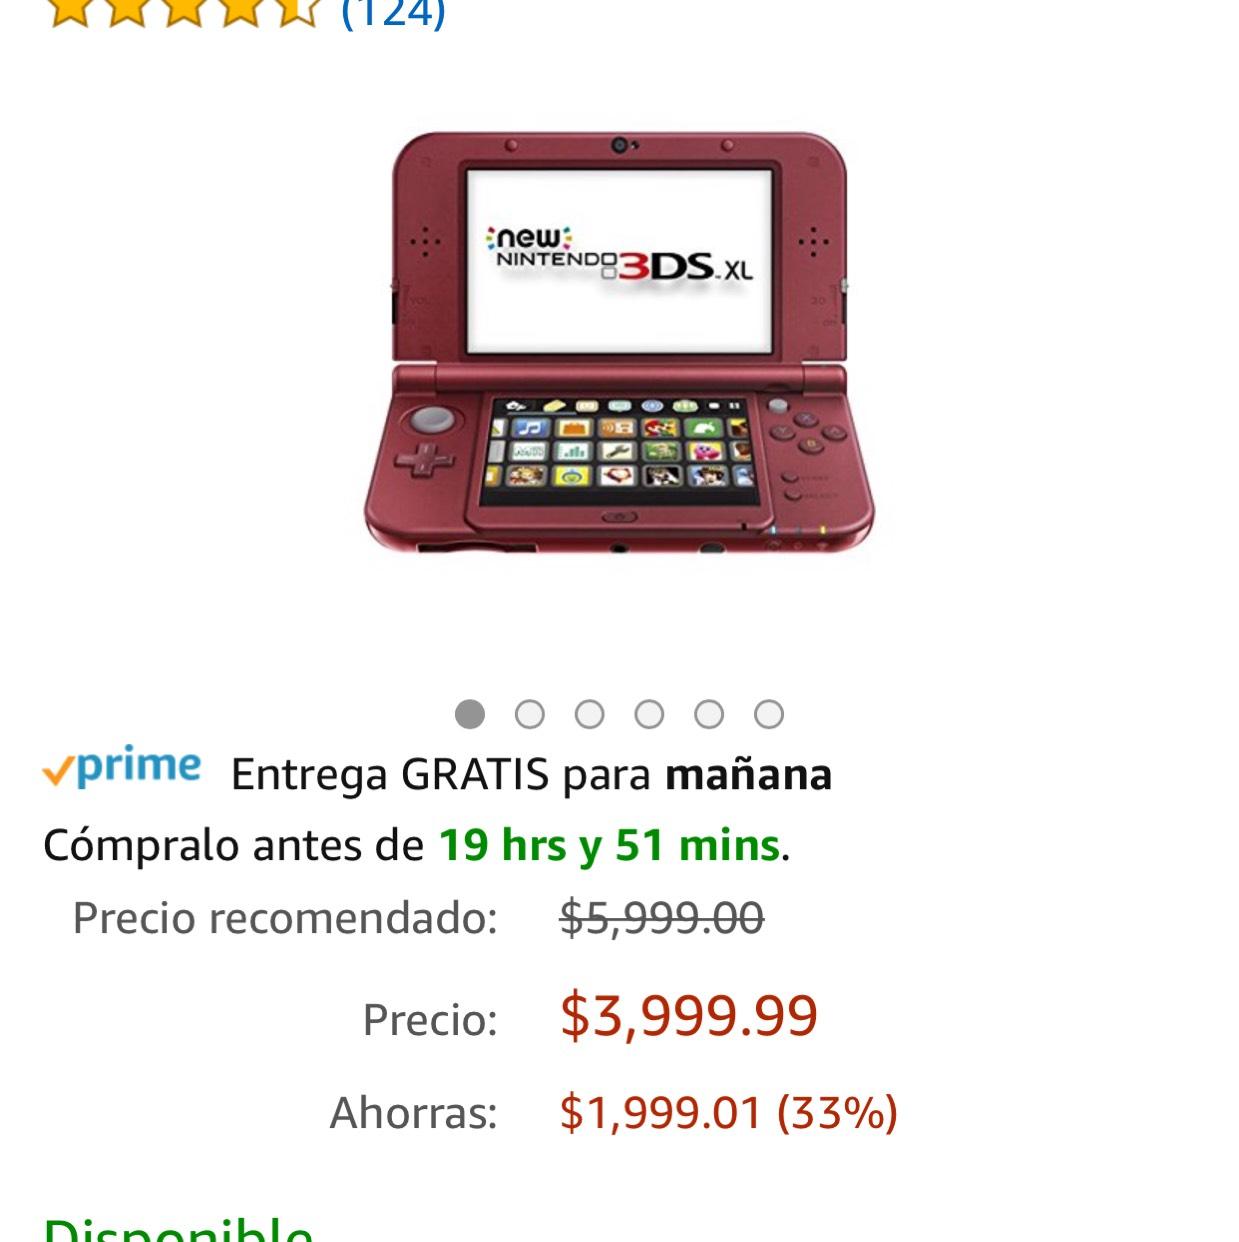 Amazon: Consola 3DS XL New, Rojo - Standard Edition